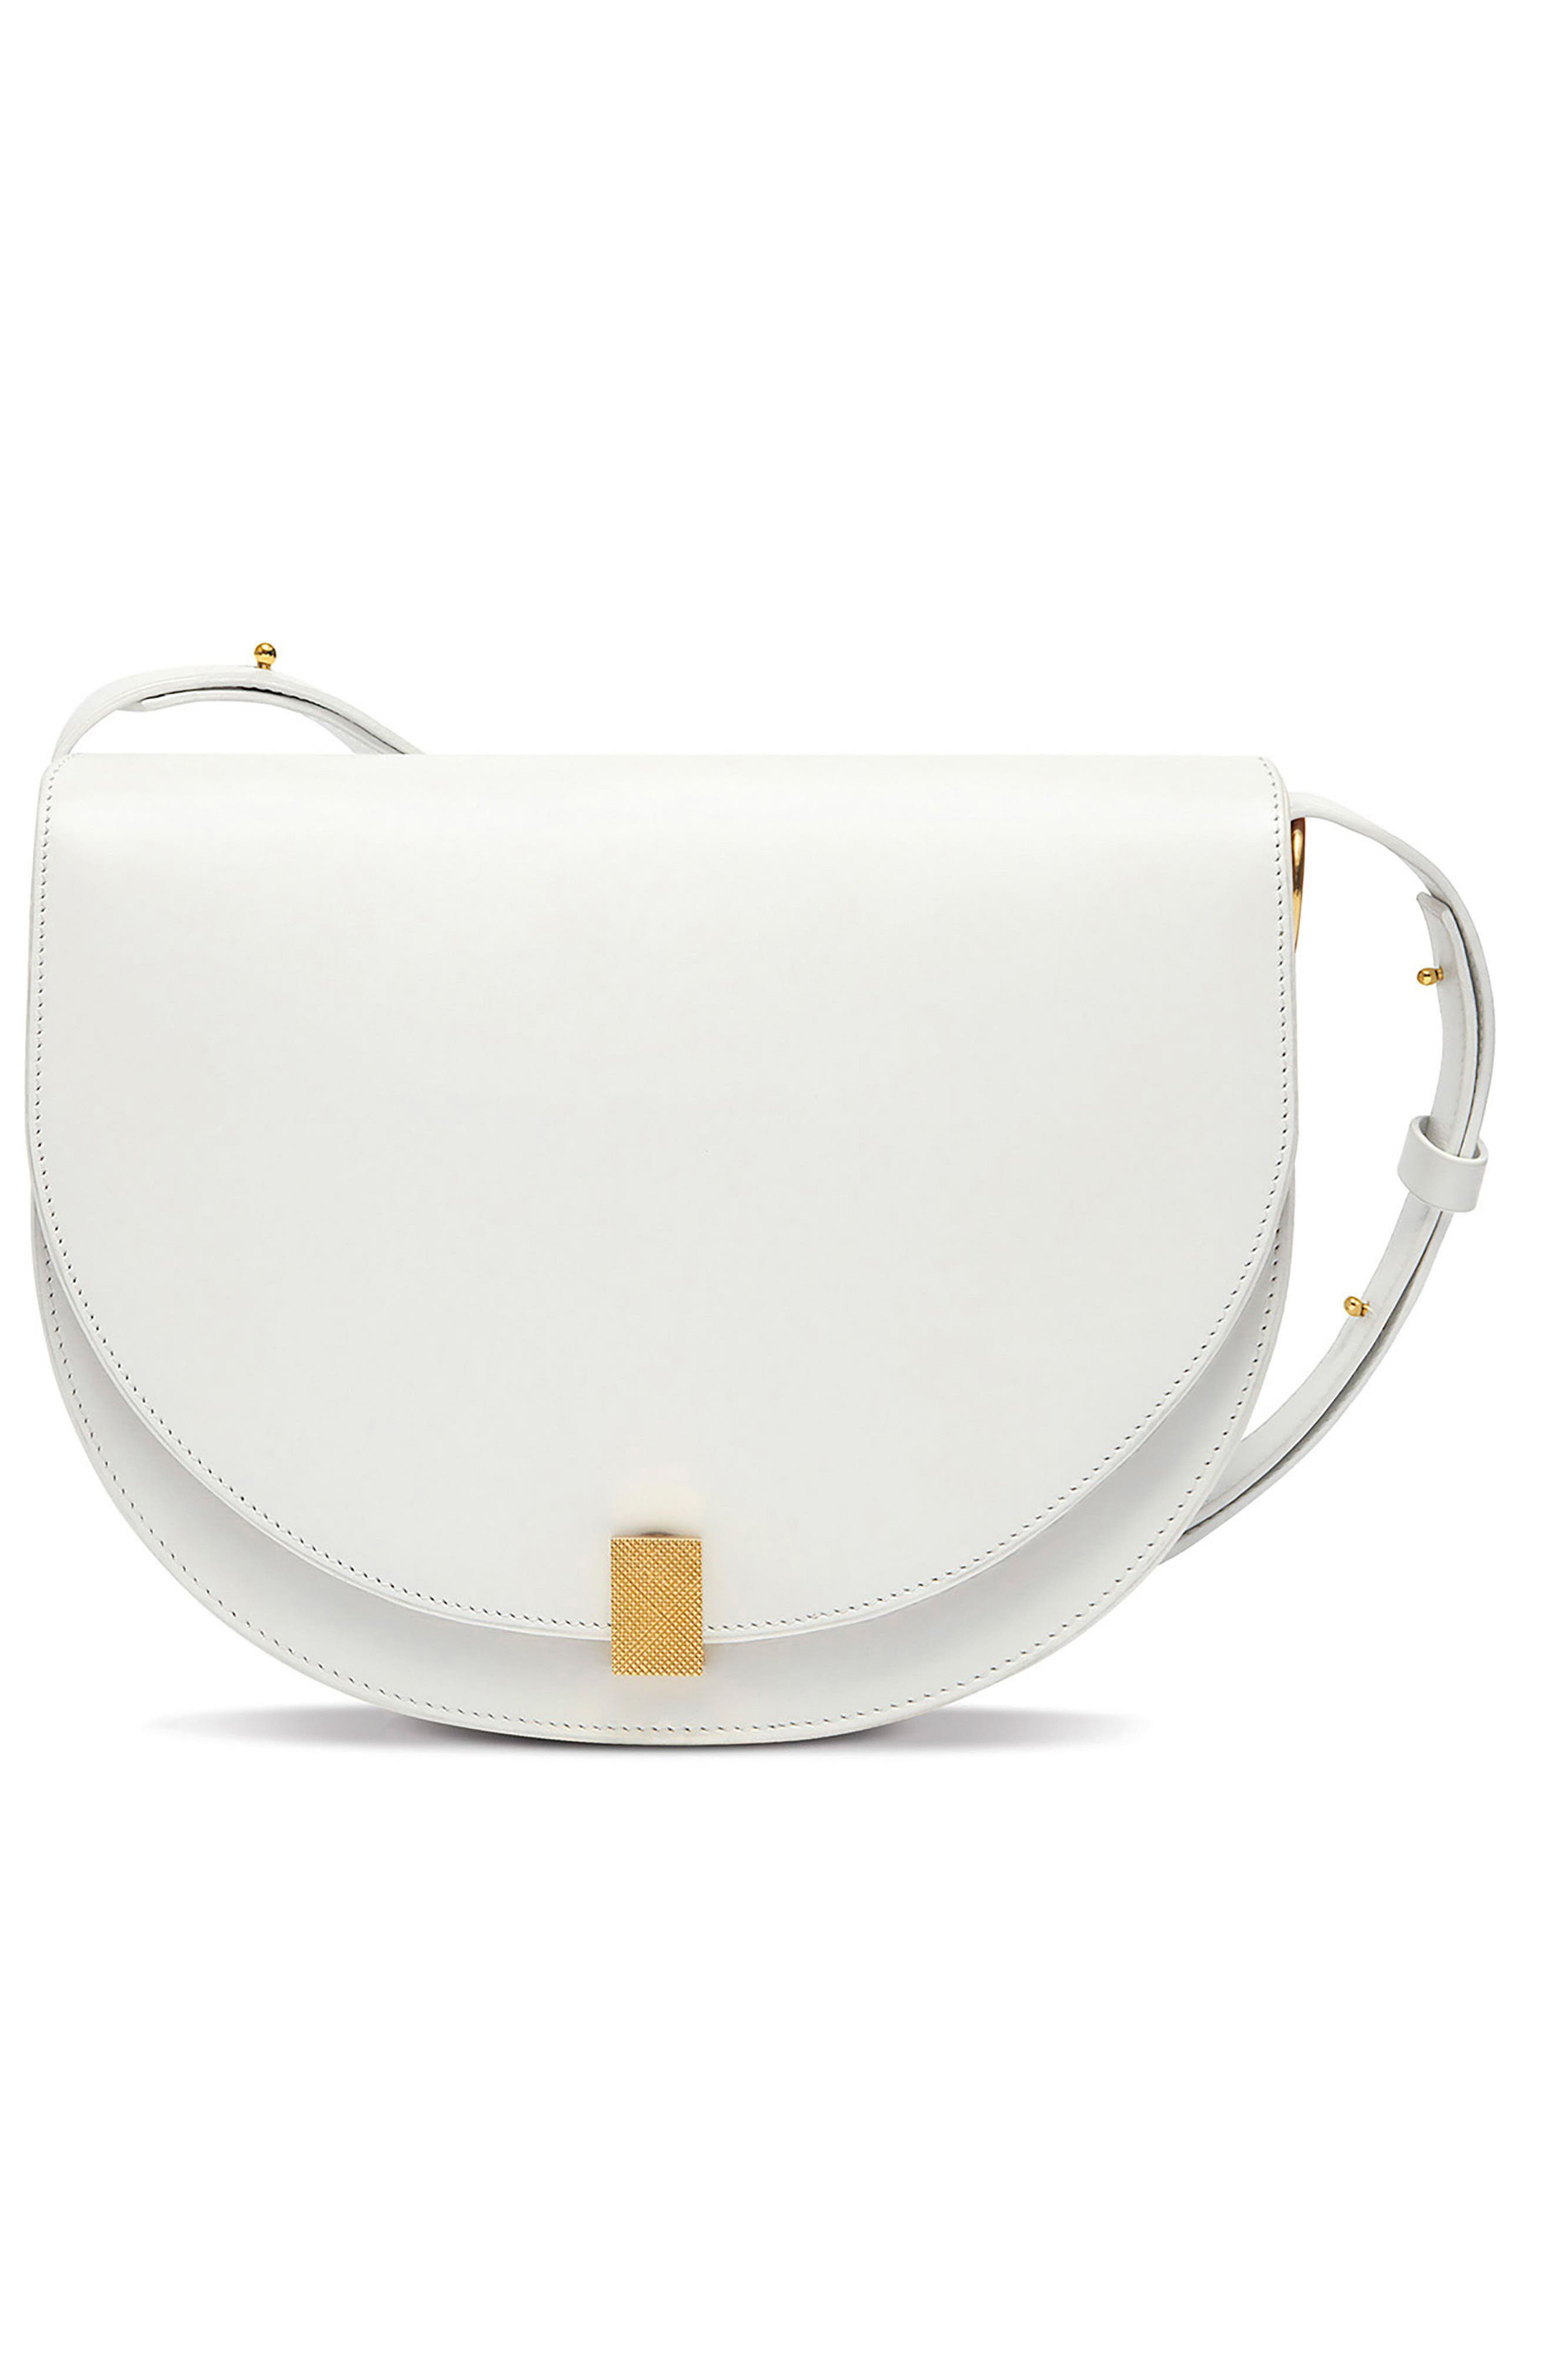 Half Moon Box Shoulder Bag,                             Alternate thumbnail 4, color,                             WHITE